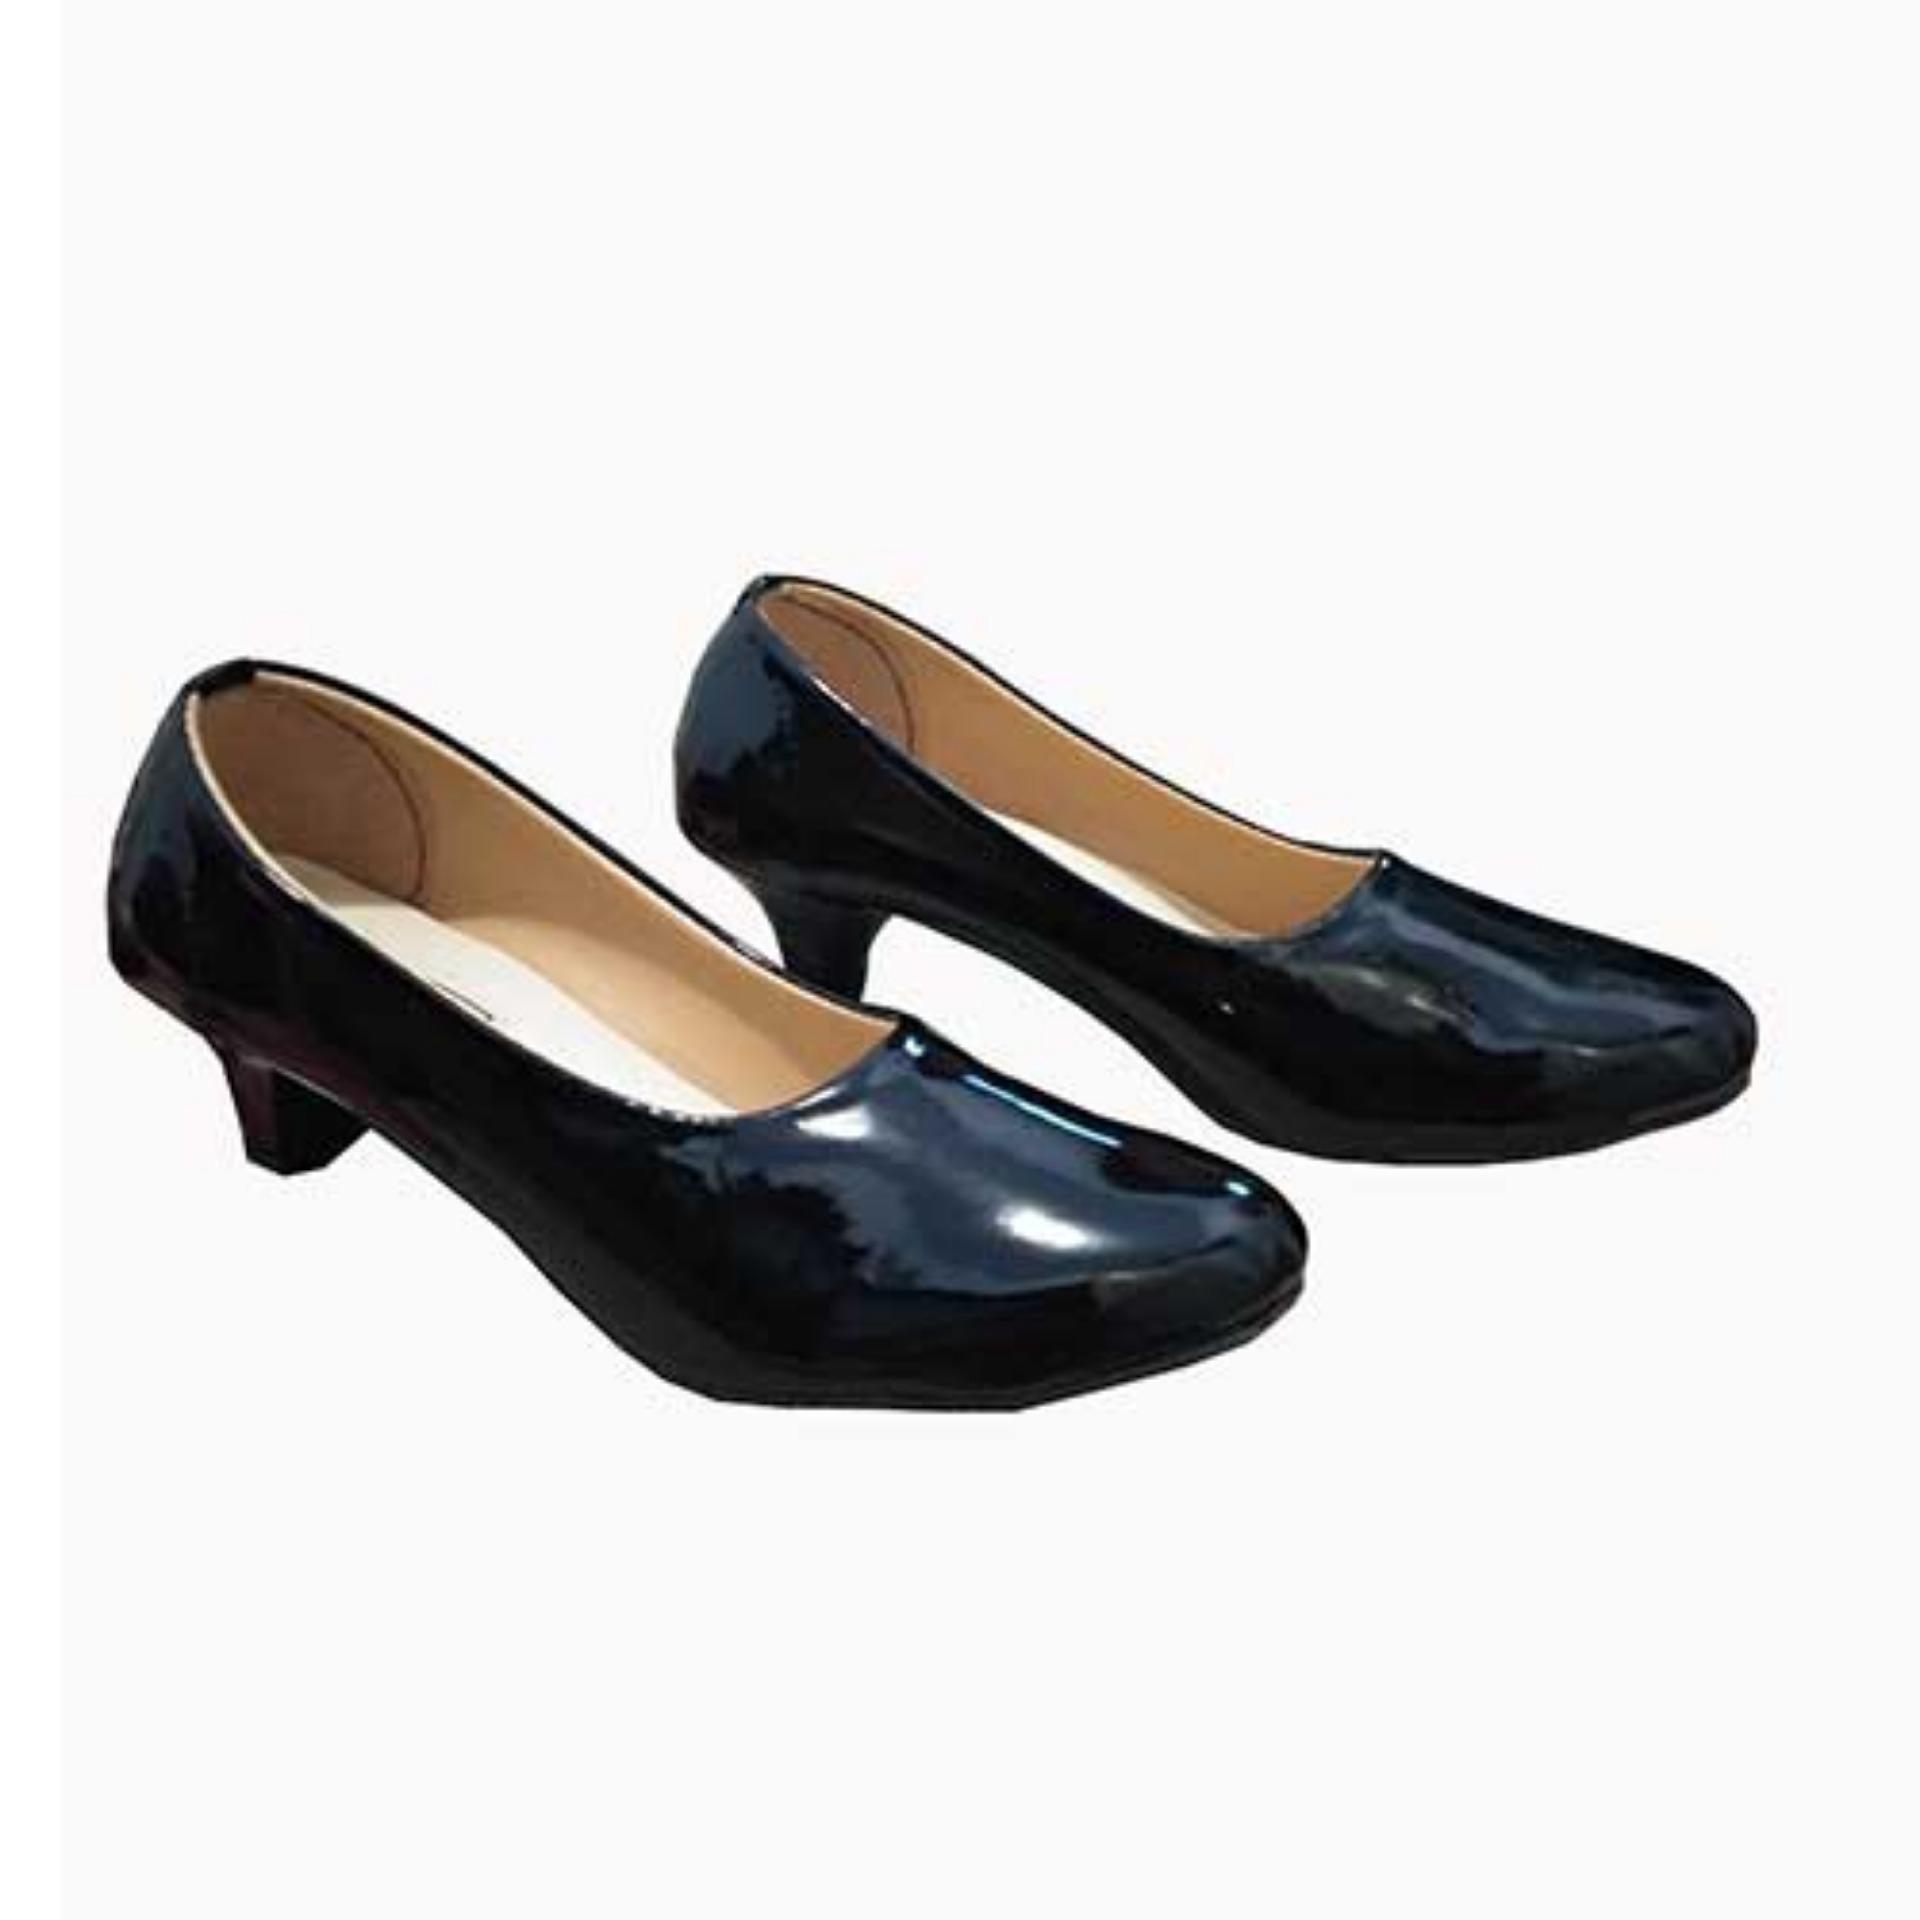 Own Works Sepatu Kerja Pantofel High Heels Wanita BB01 - Hitam